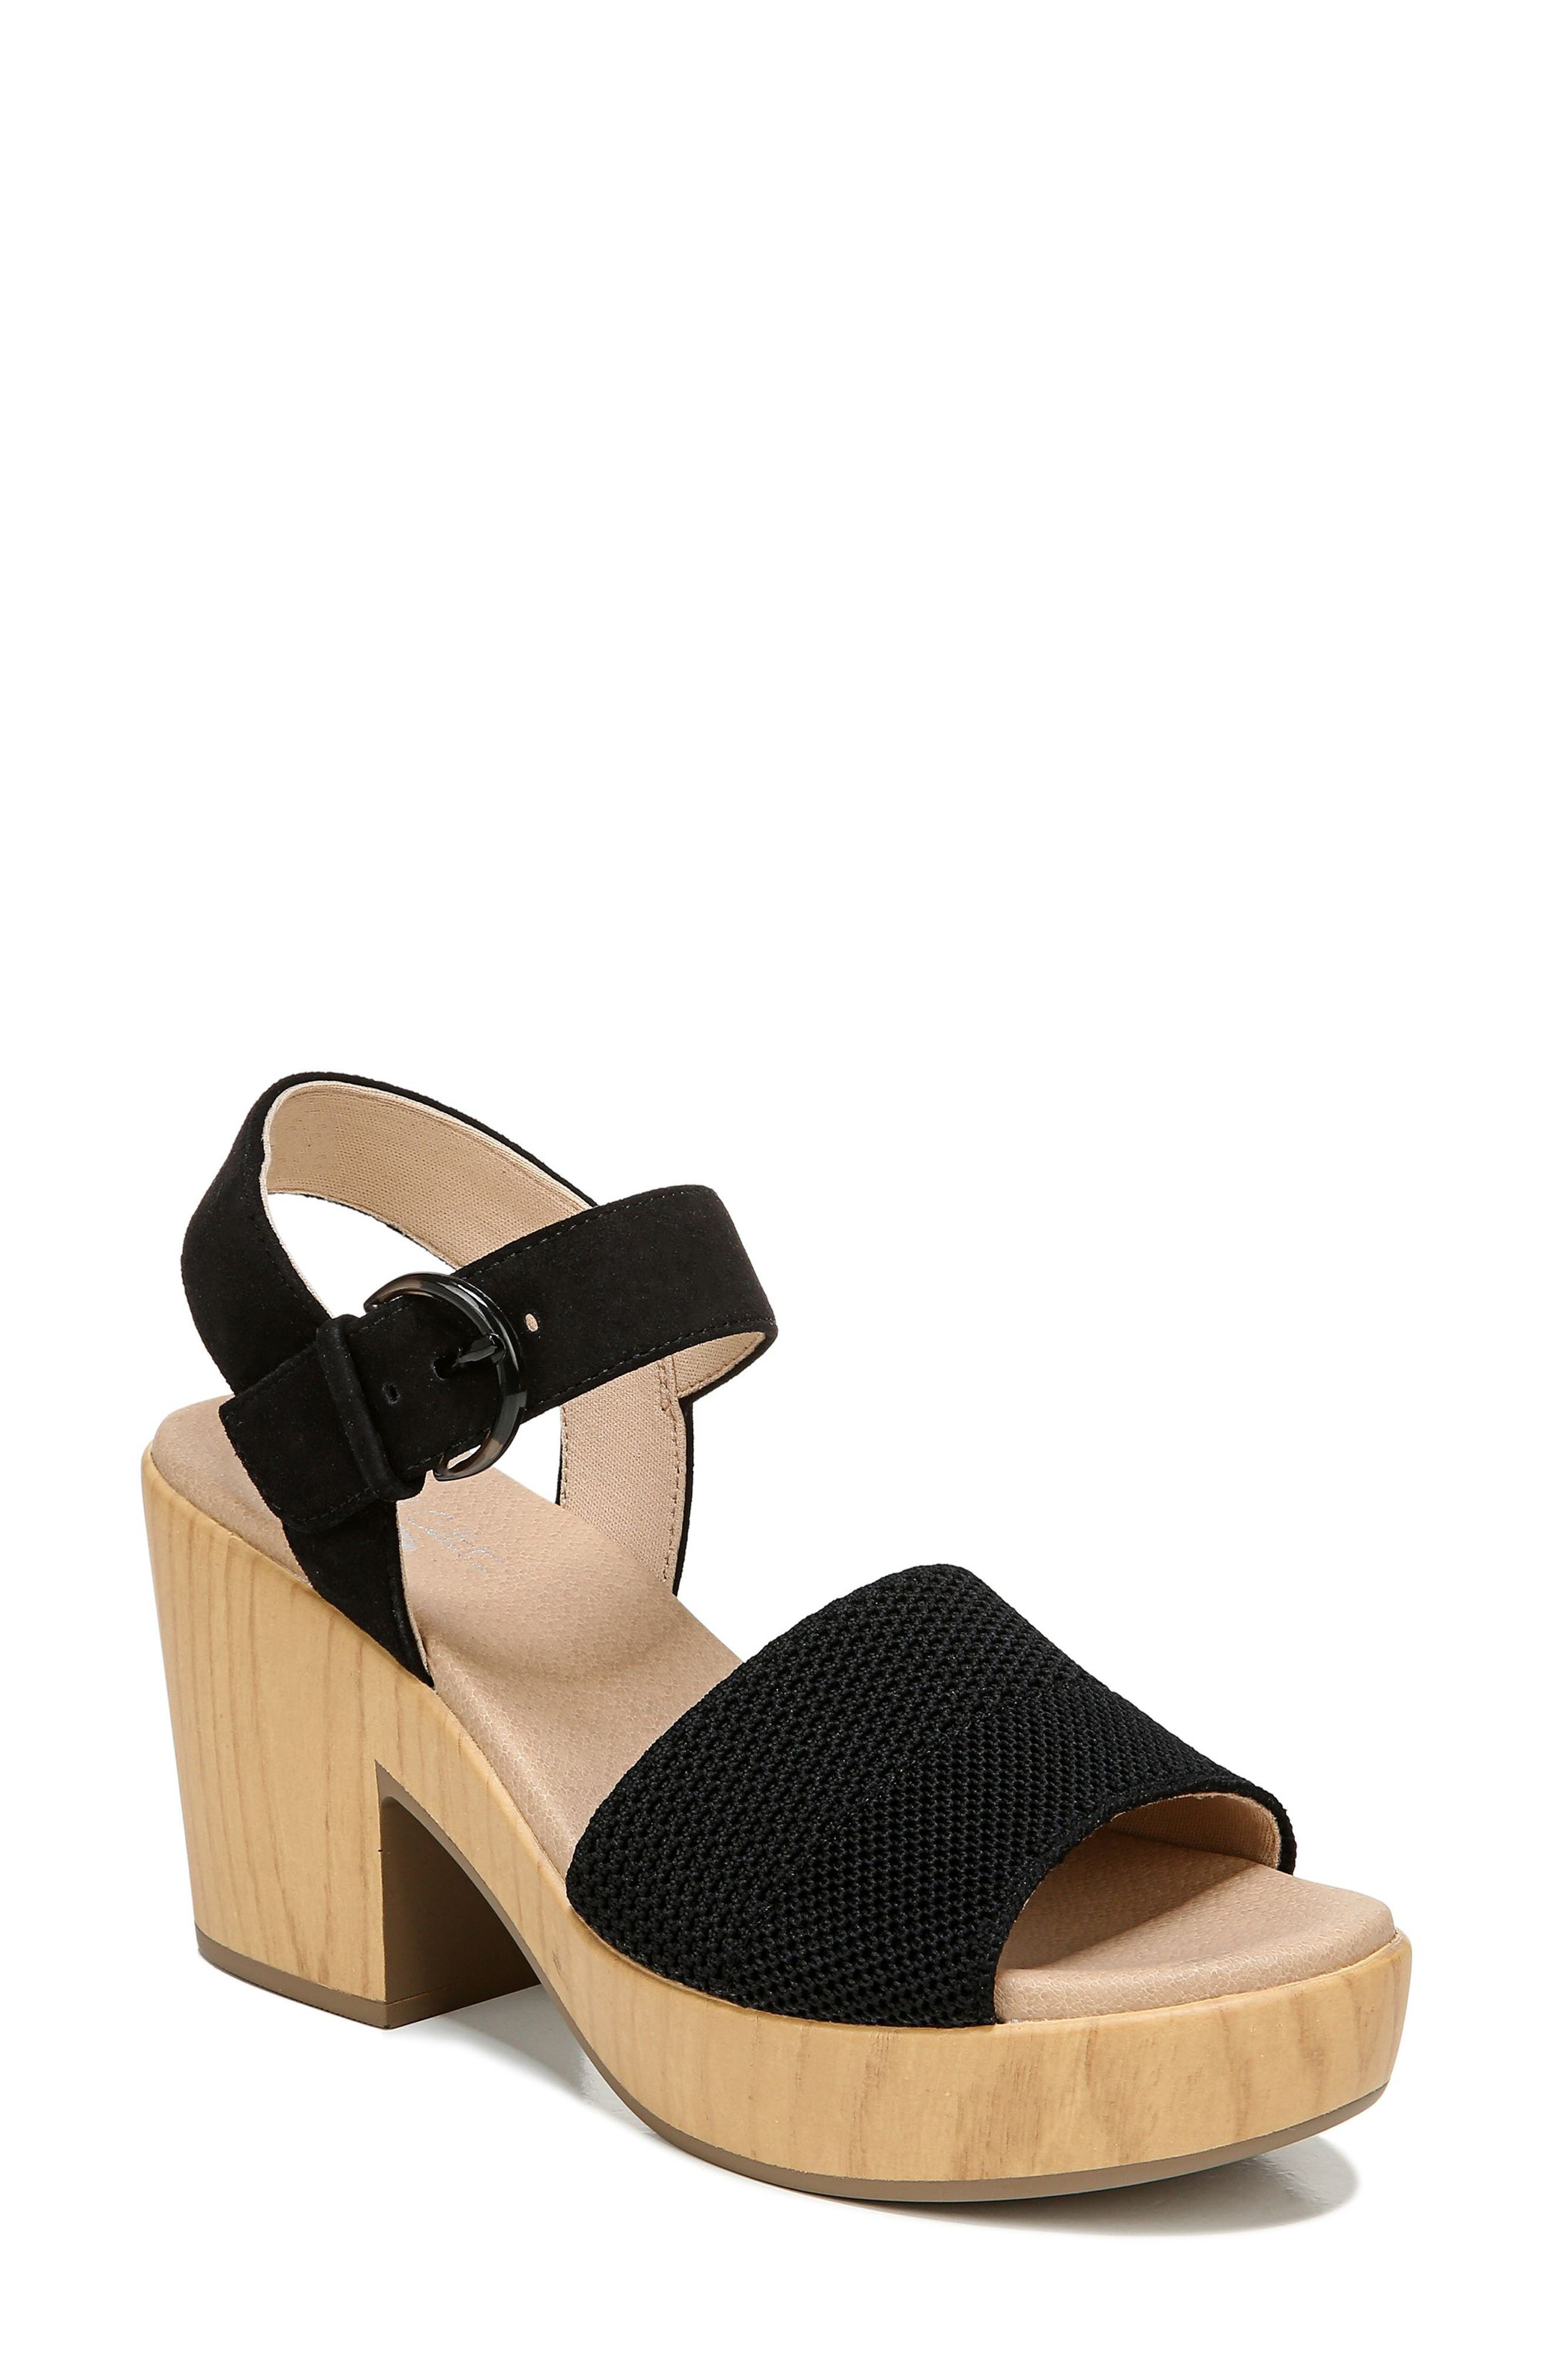 Brickell Eco Block Heel Sandal